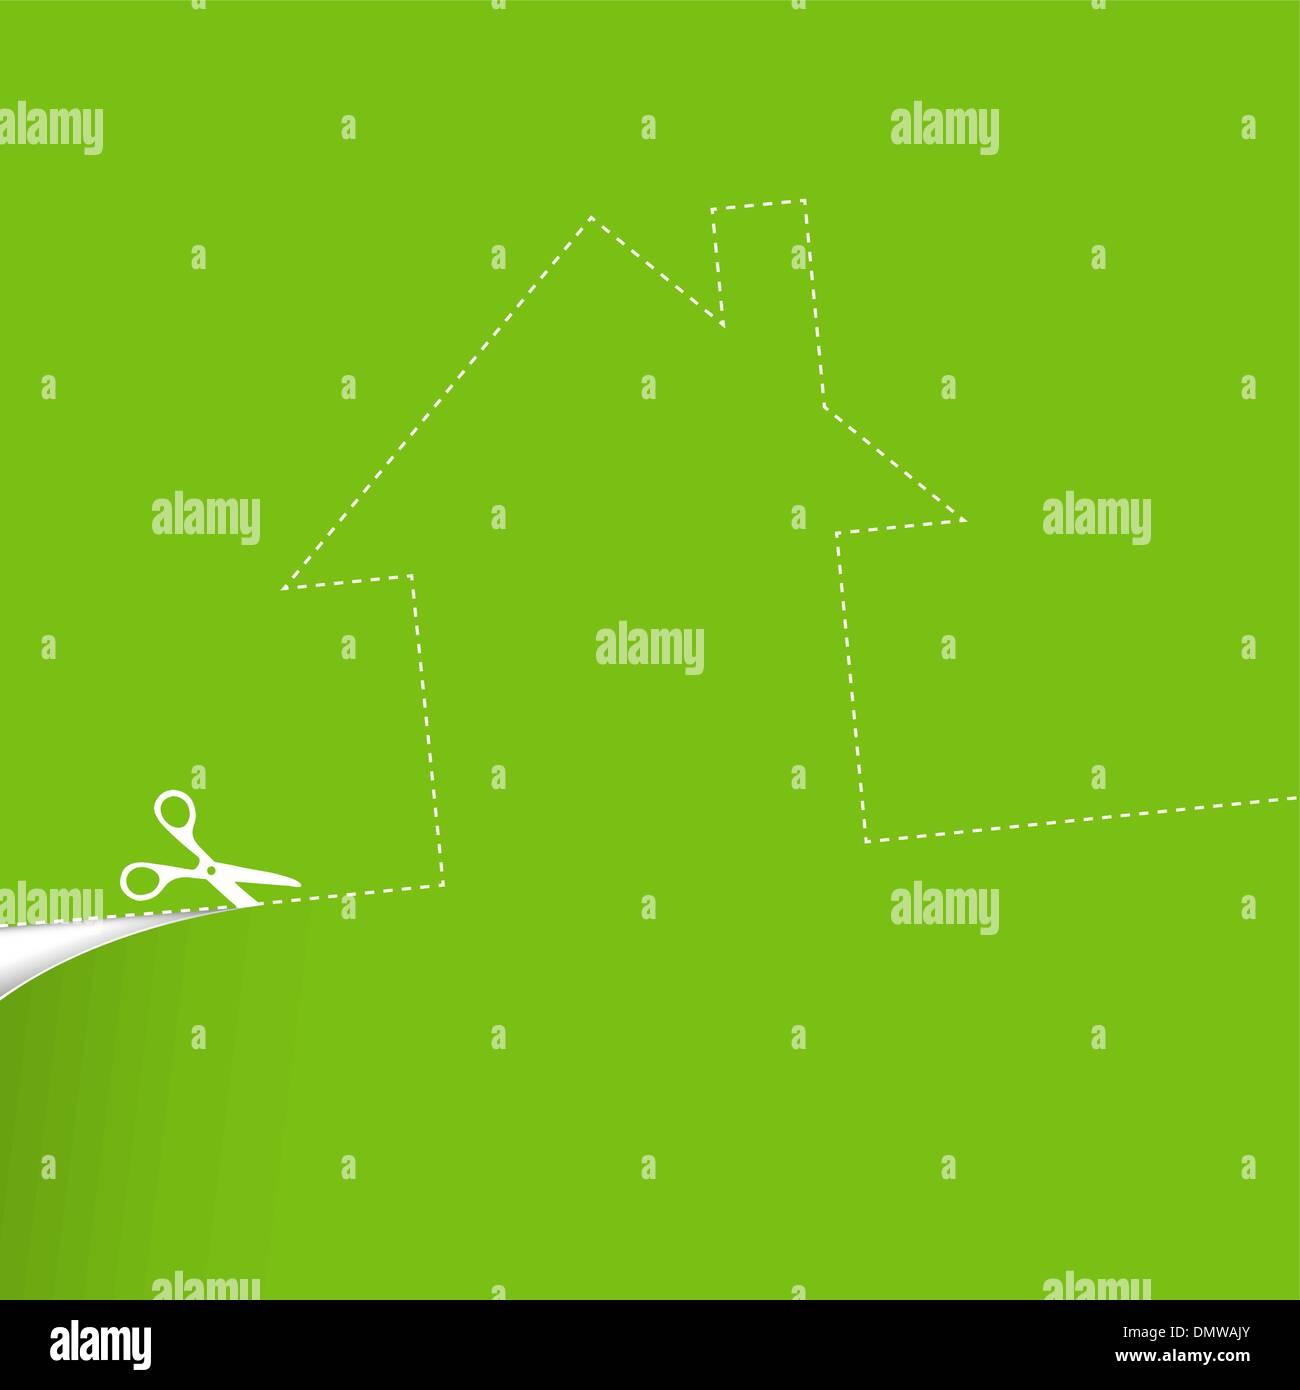 Ecological housing concept illustration. - Stock Image